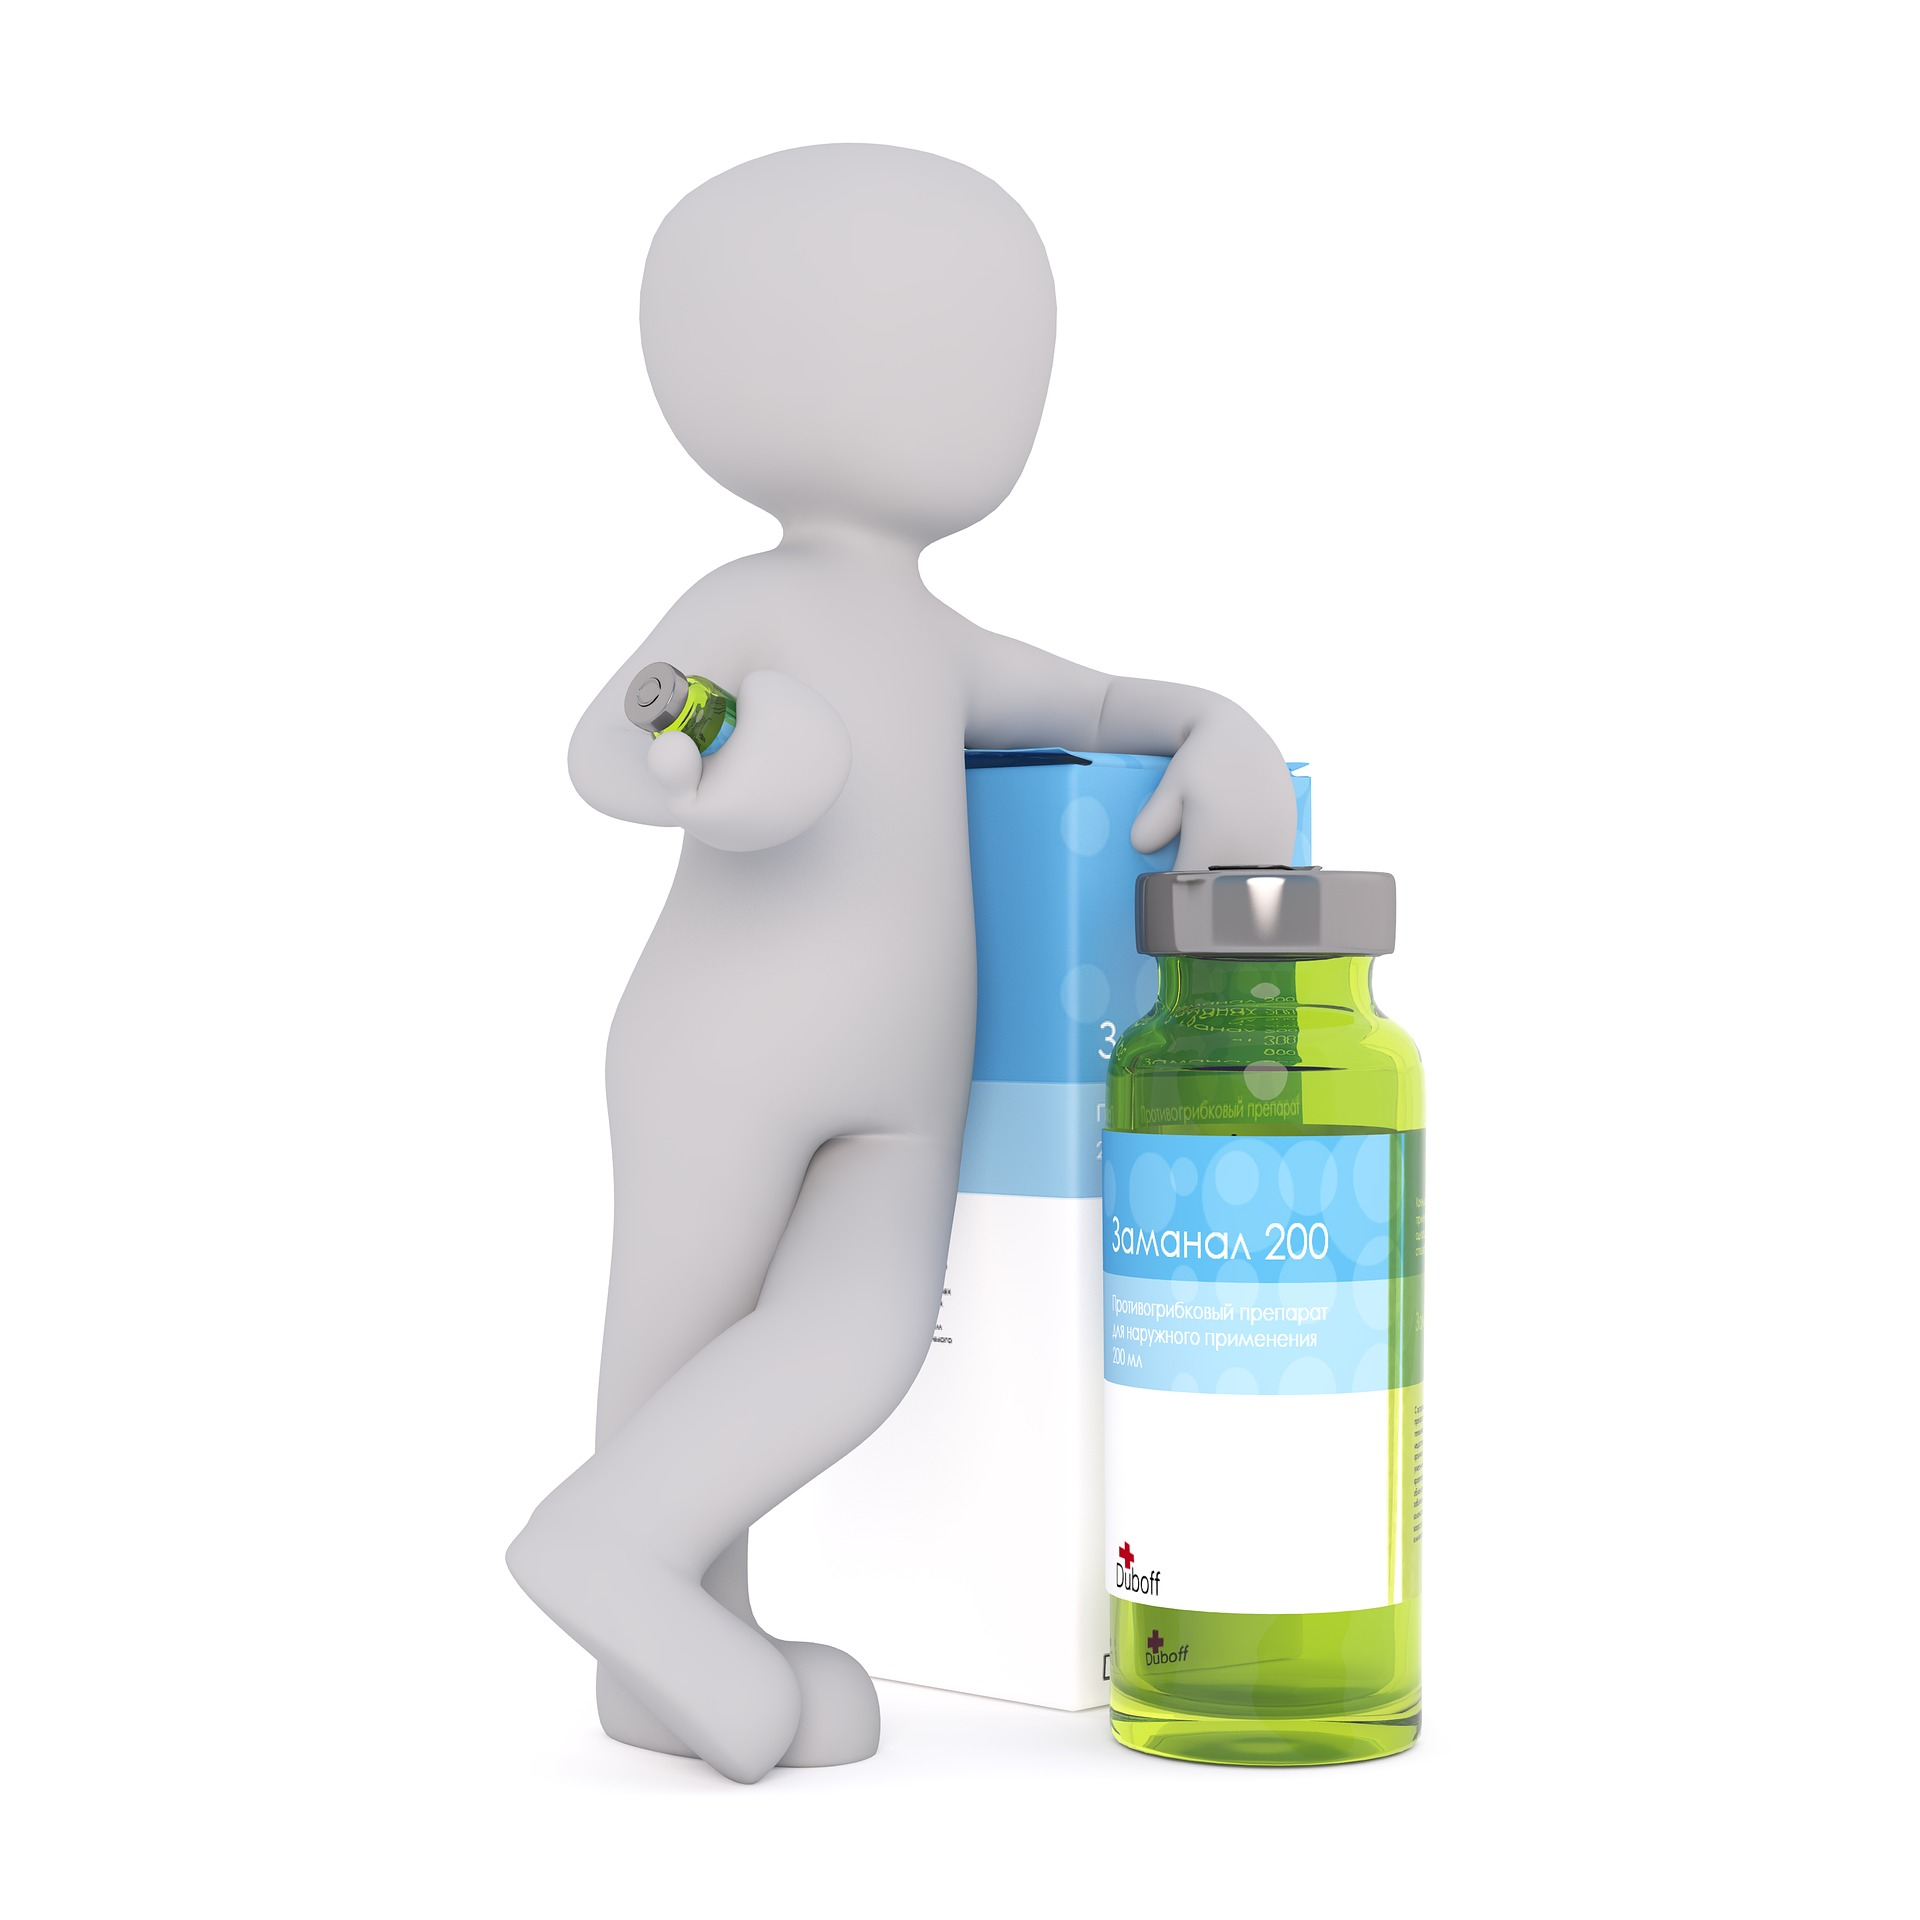 preservative-free vaccine